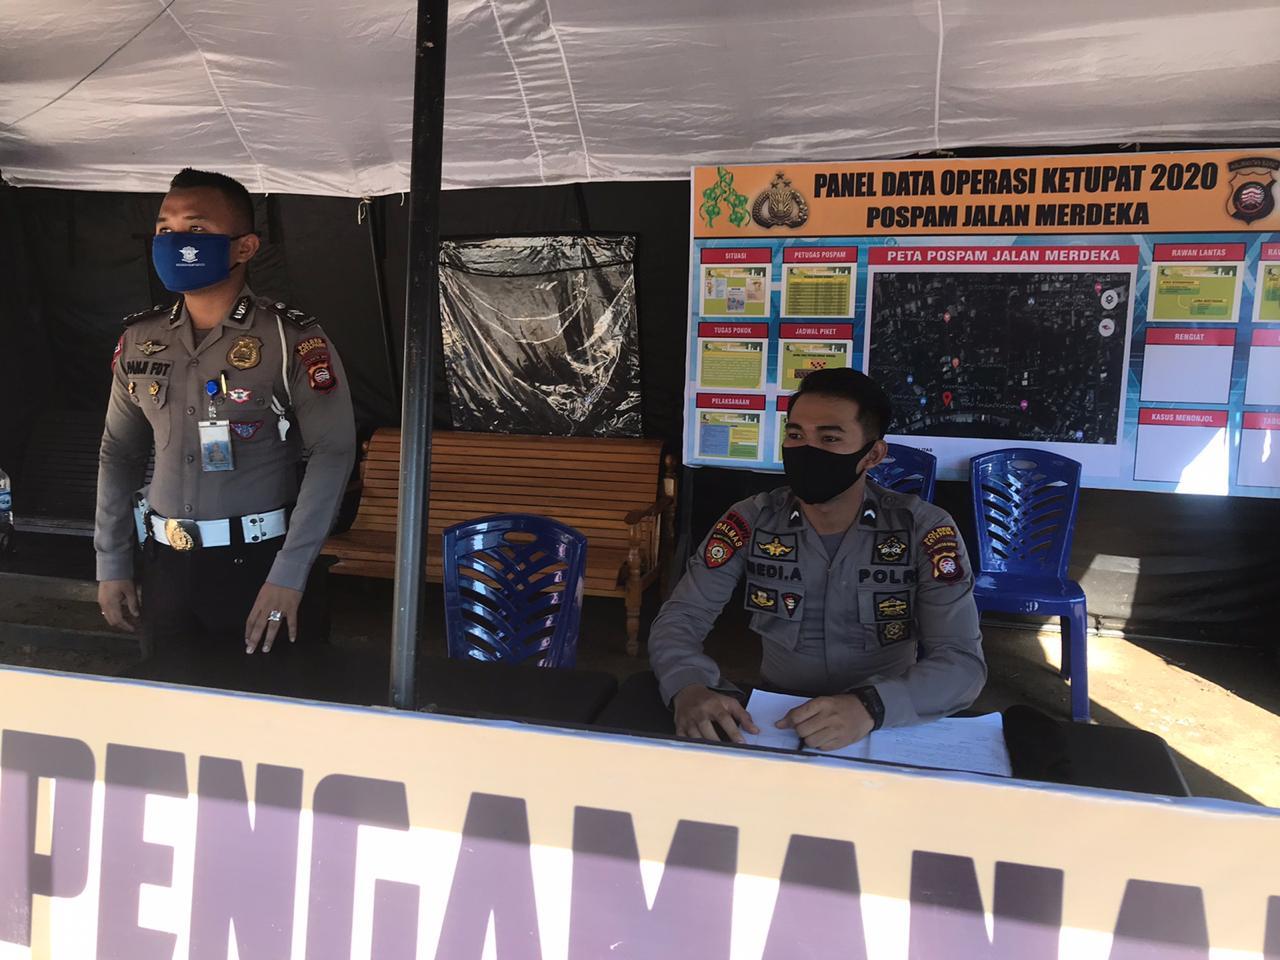 Ops Ketupat Kapuas 2020, Anggota Satlantas Polres Ketapang piket Pos Pam di Kawasan Bundaran Ale Ale